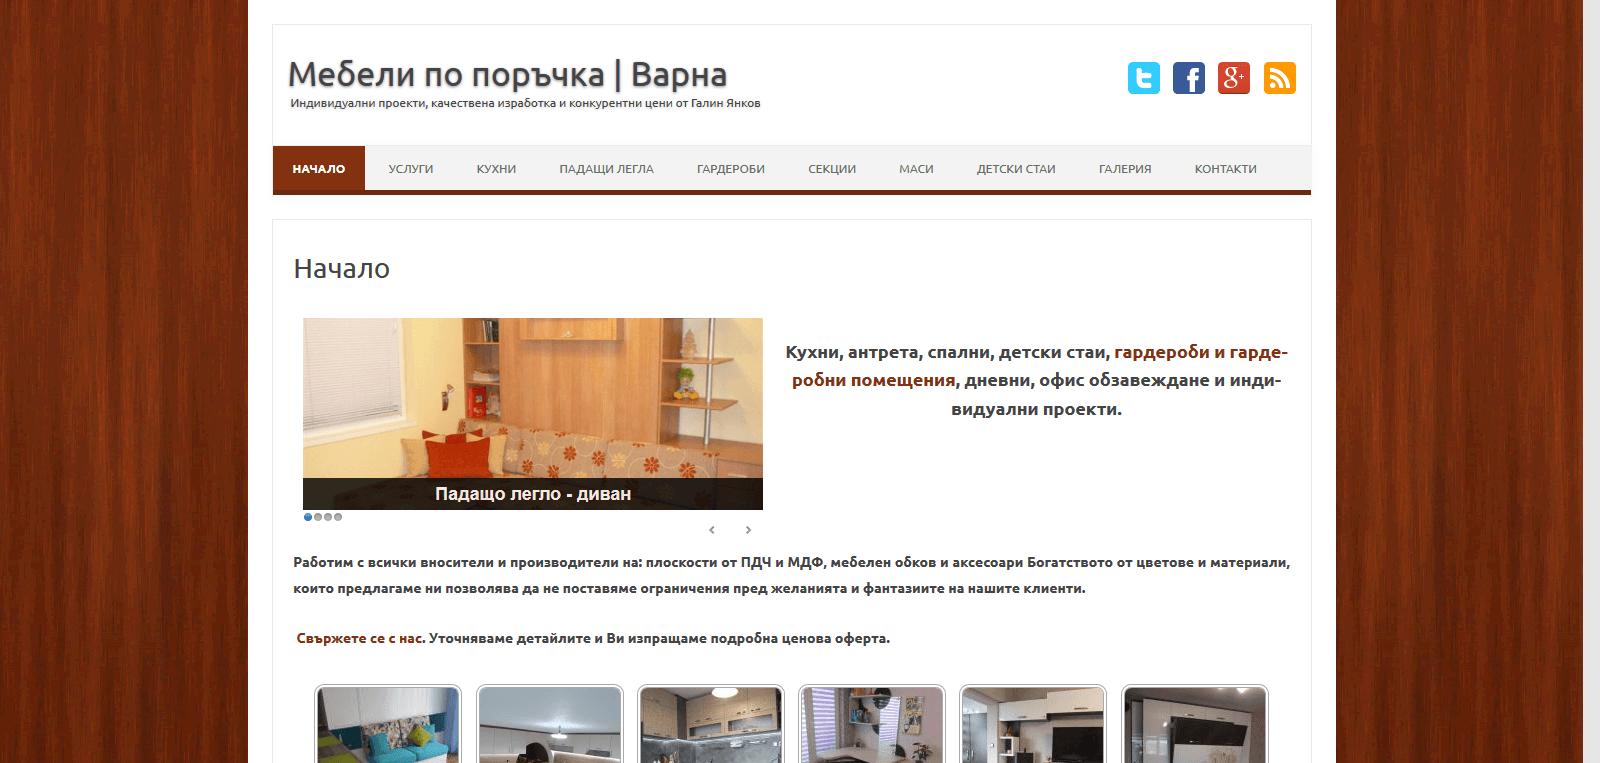 galin.yankov.net